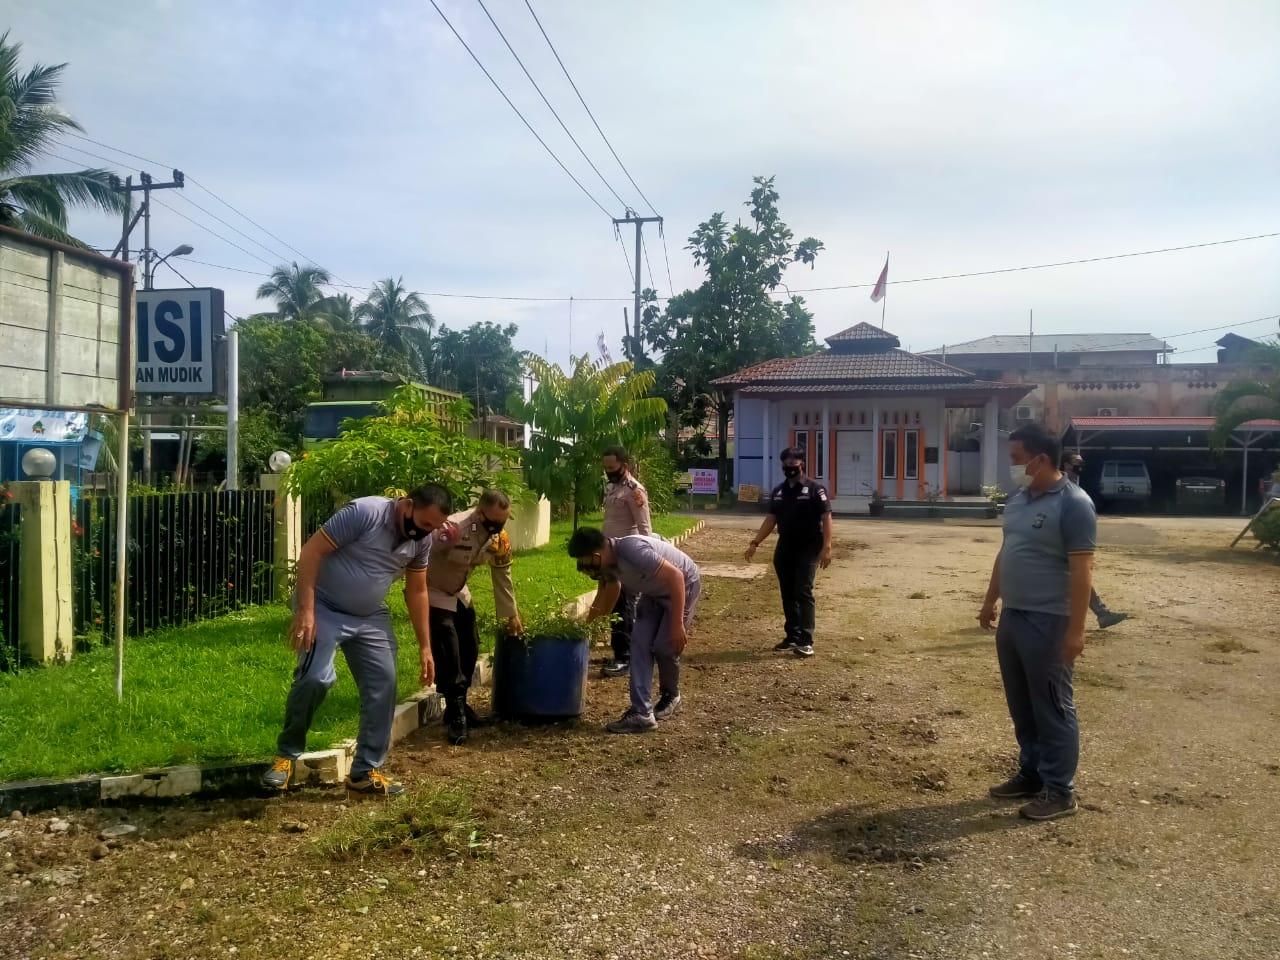 Kapolsek Kuantan Mudik Utamakan Lingkungan Bersih Menjelang Ramadhan